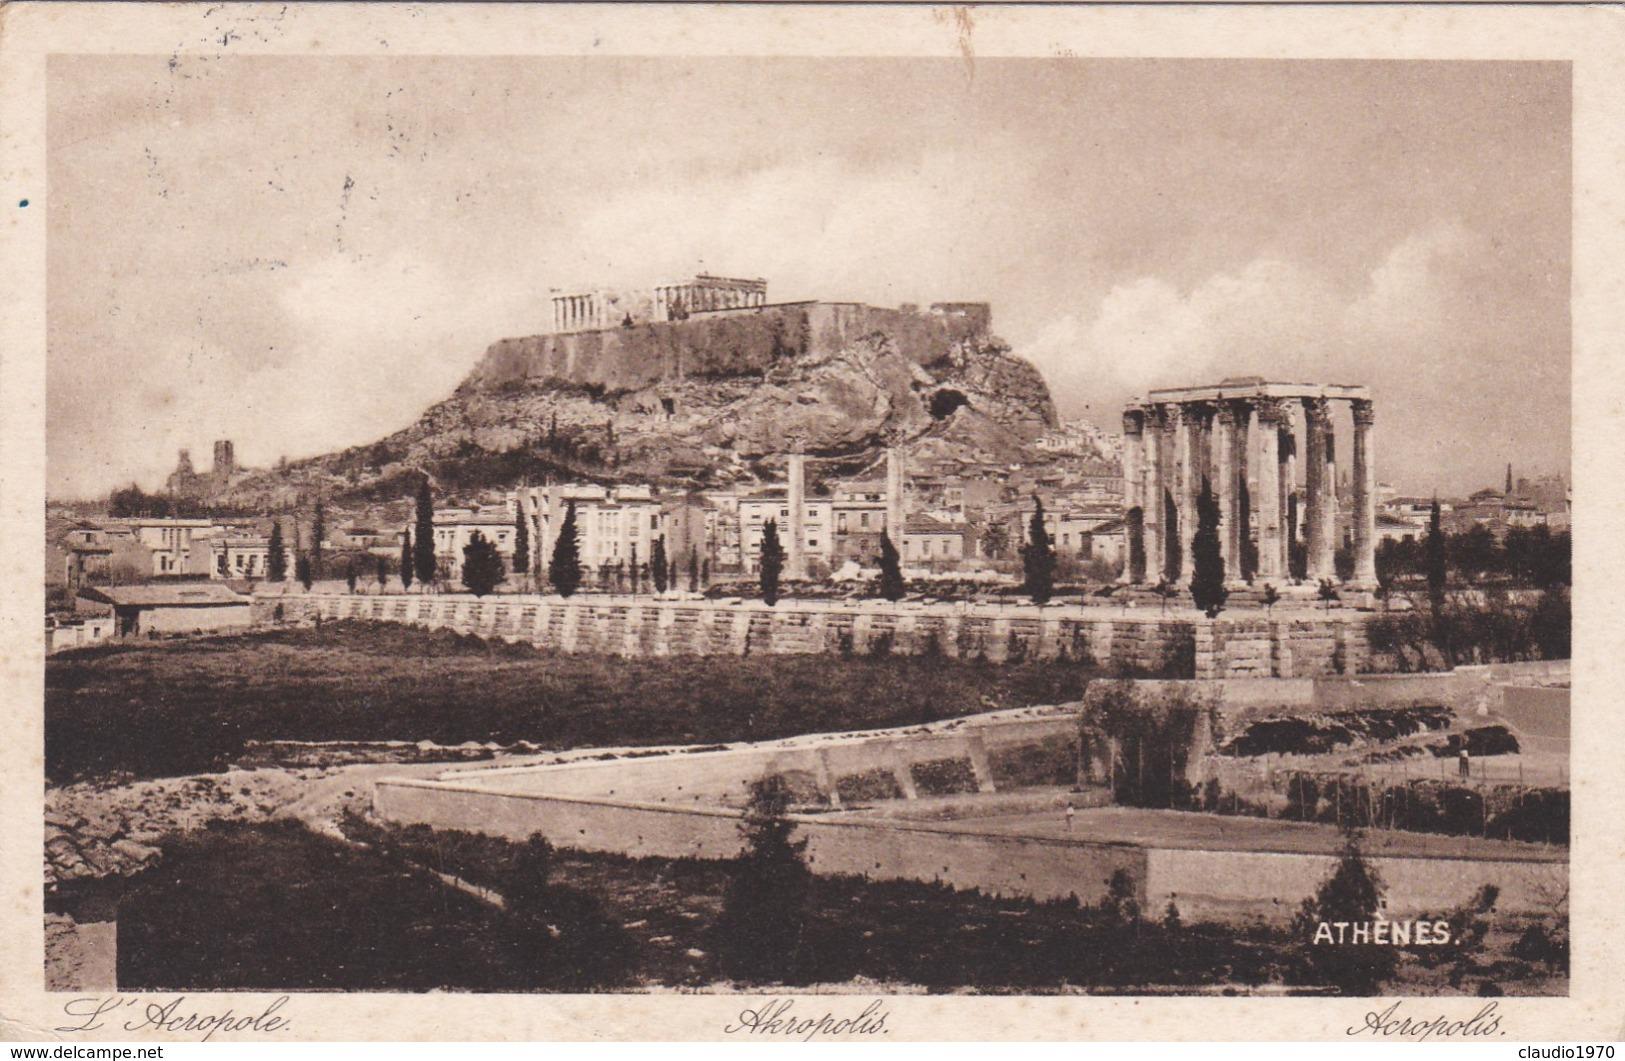 CARTOLINA - POSTCARD - GRECIA - ATHèNES - ACROPOLIS - VIAGGIATA PER RIDANNA ( BOLZANO)  ITALY - Grecia